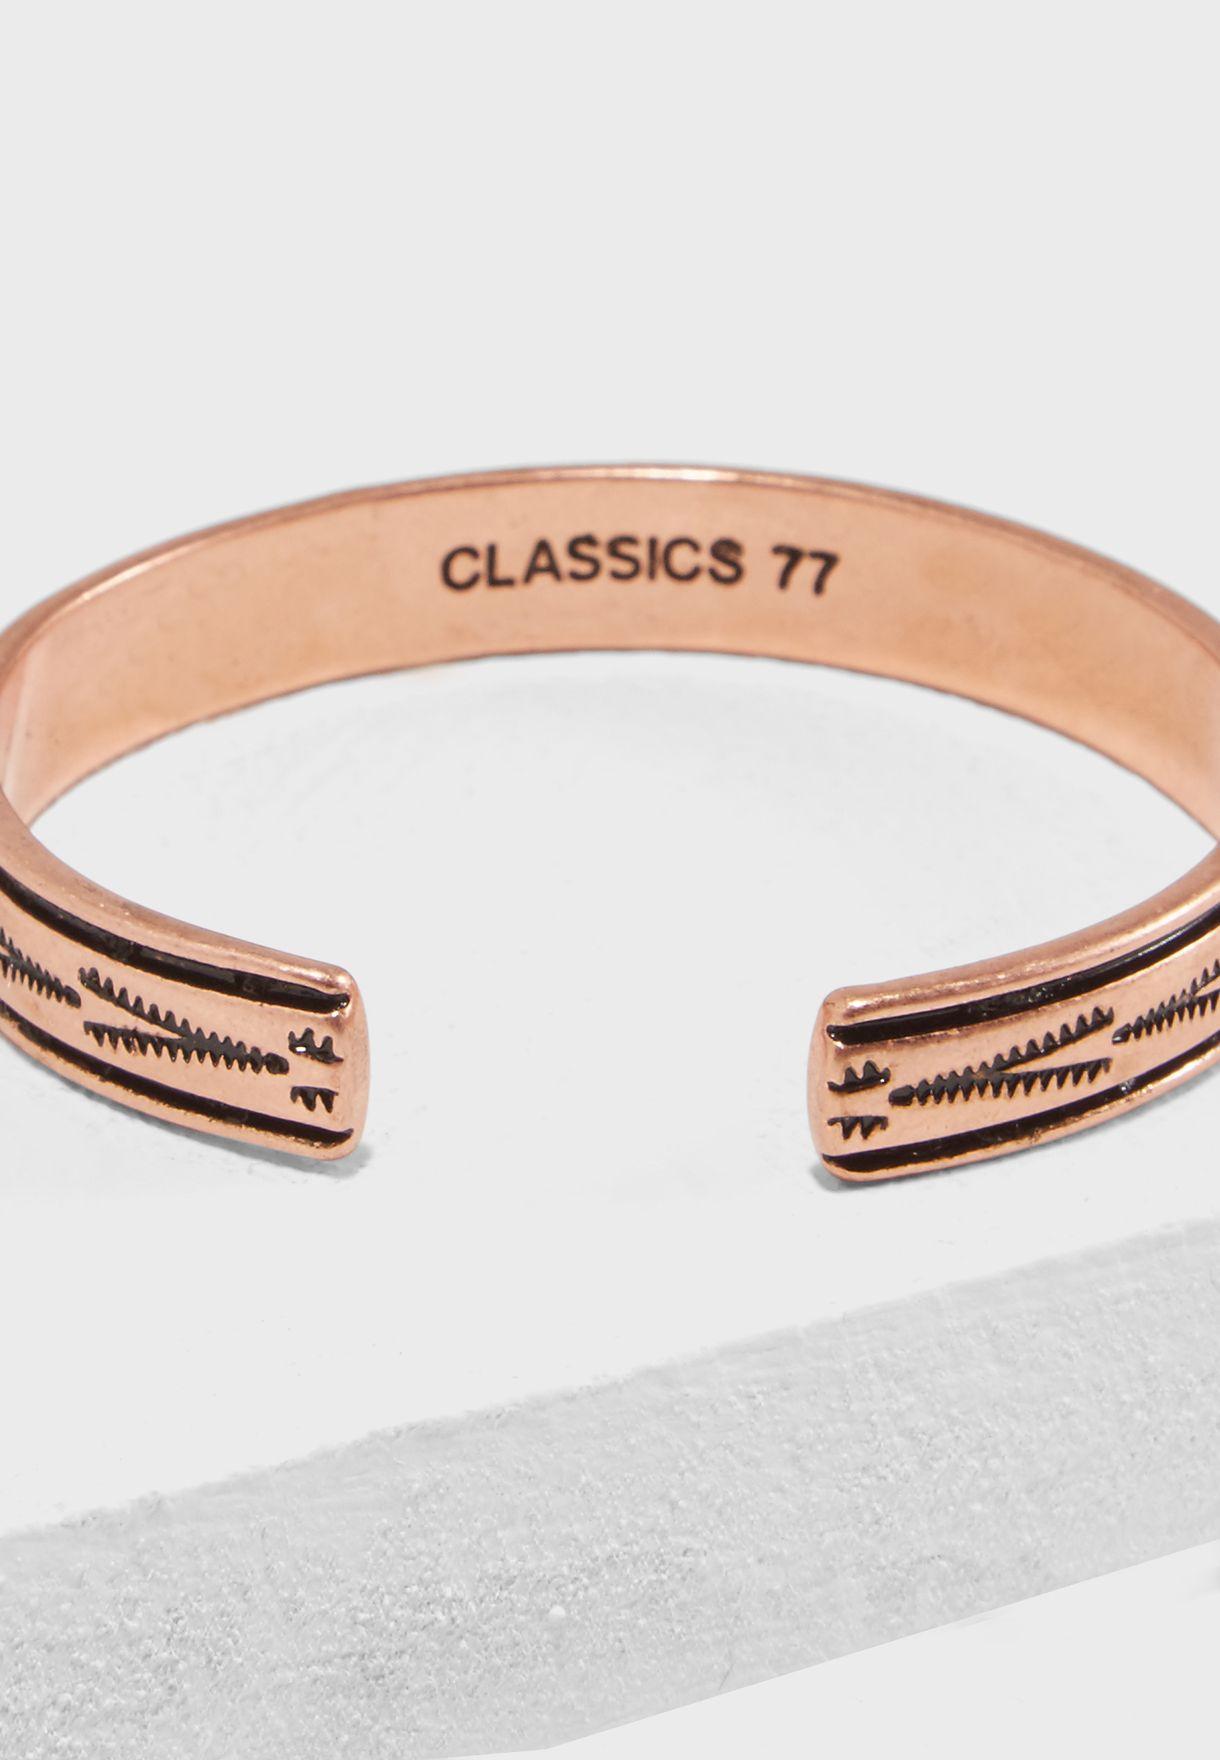 Aztec Engraved Cuff Bracelet